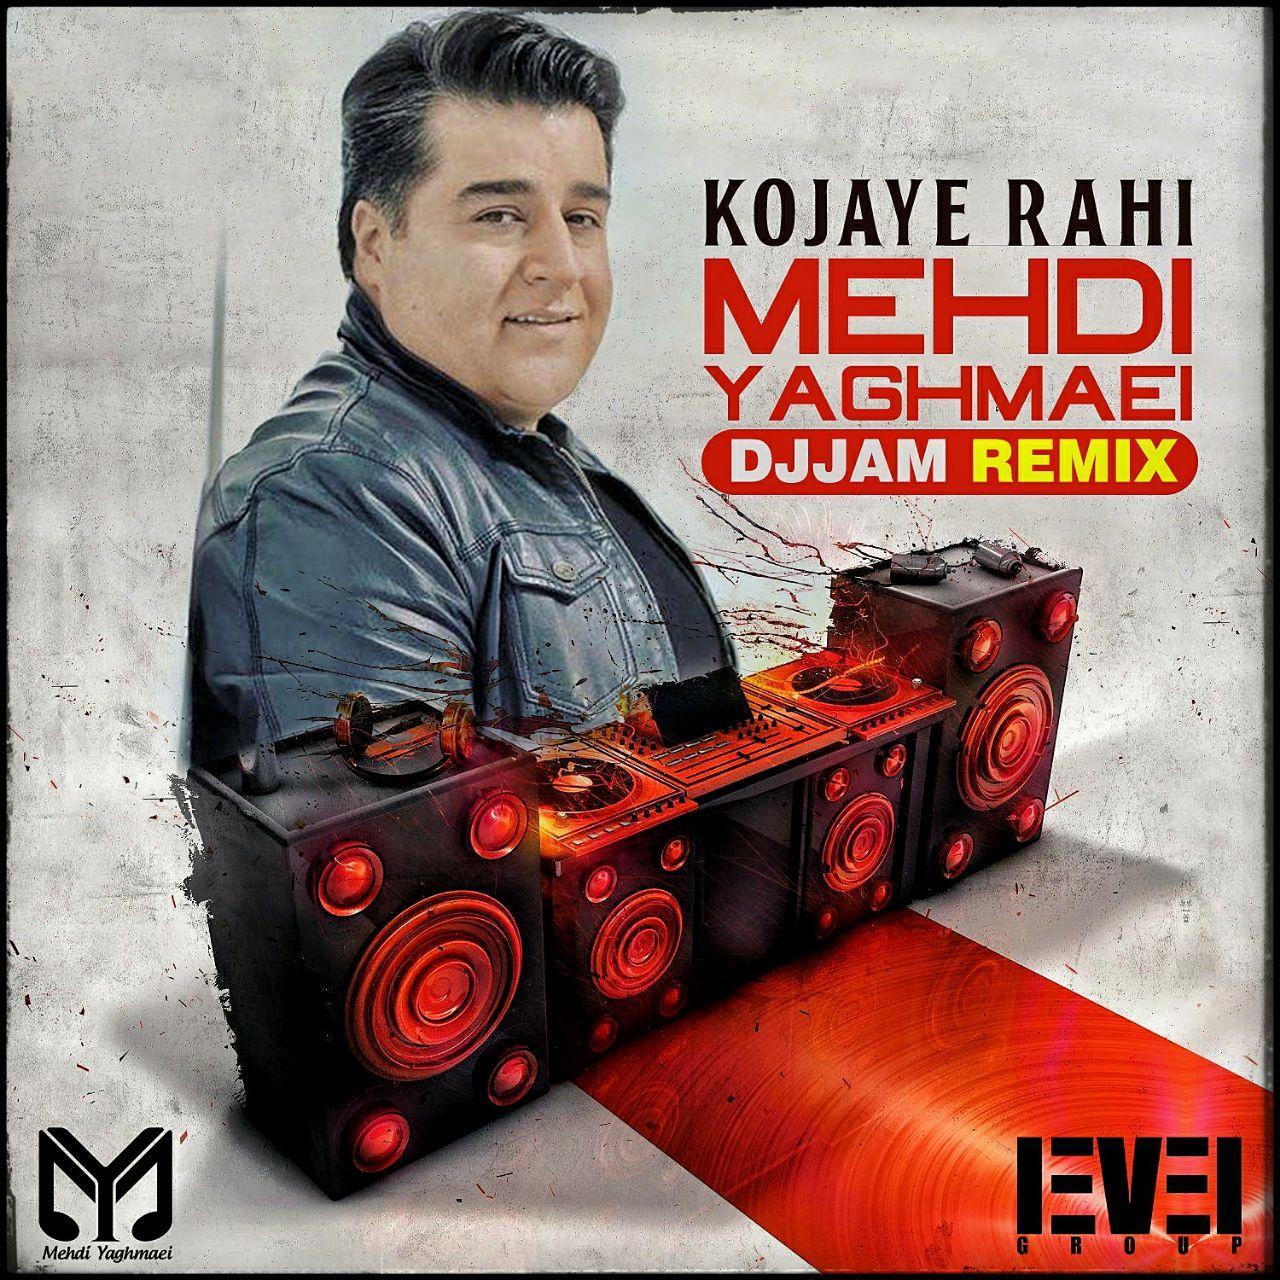 Mehdi Yaghmaei – Kojaye Rahi (DJ Jam Remix)